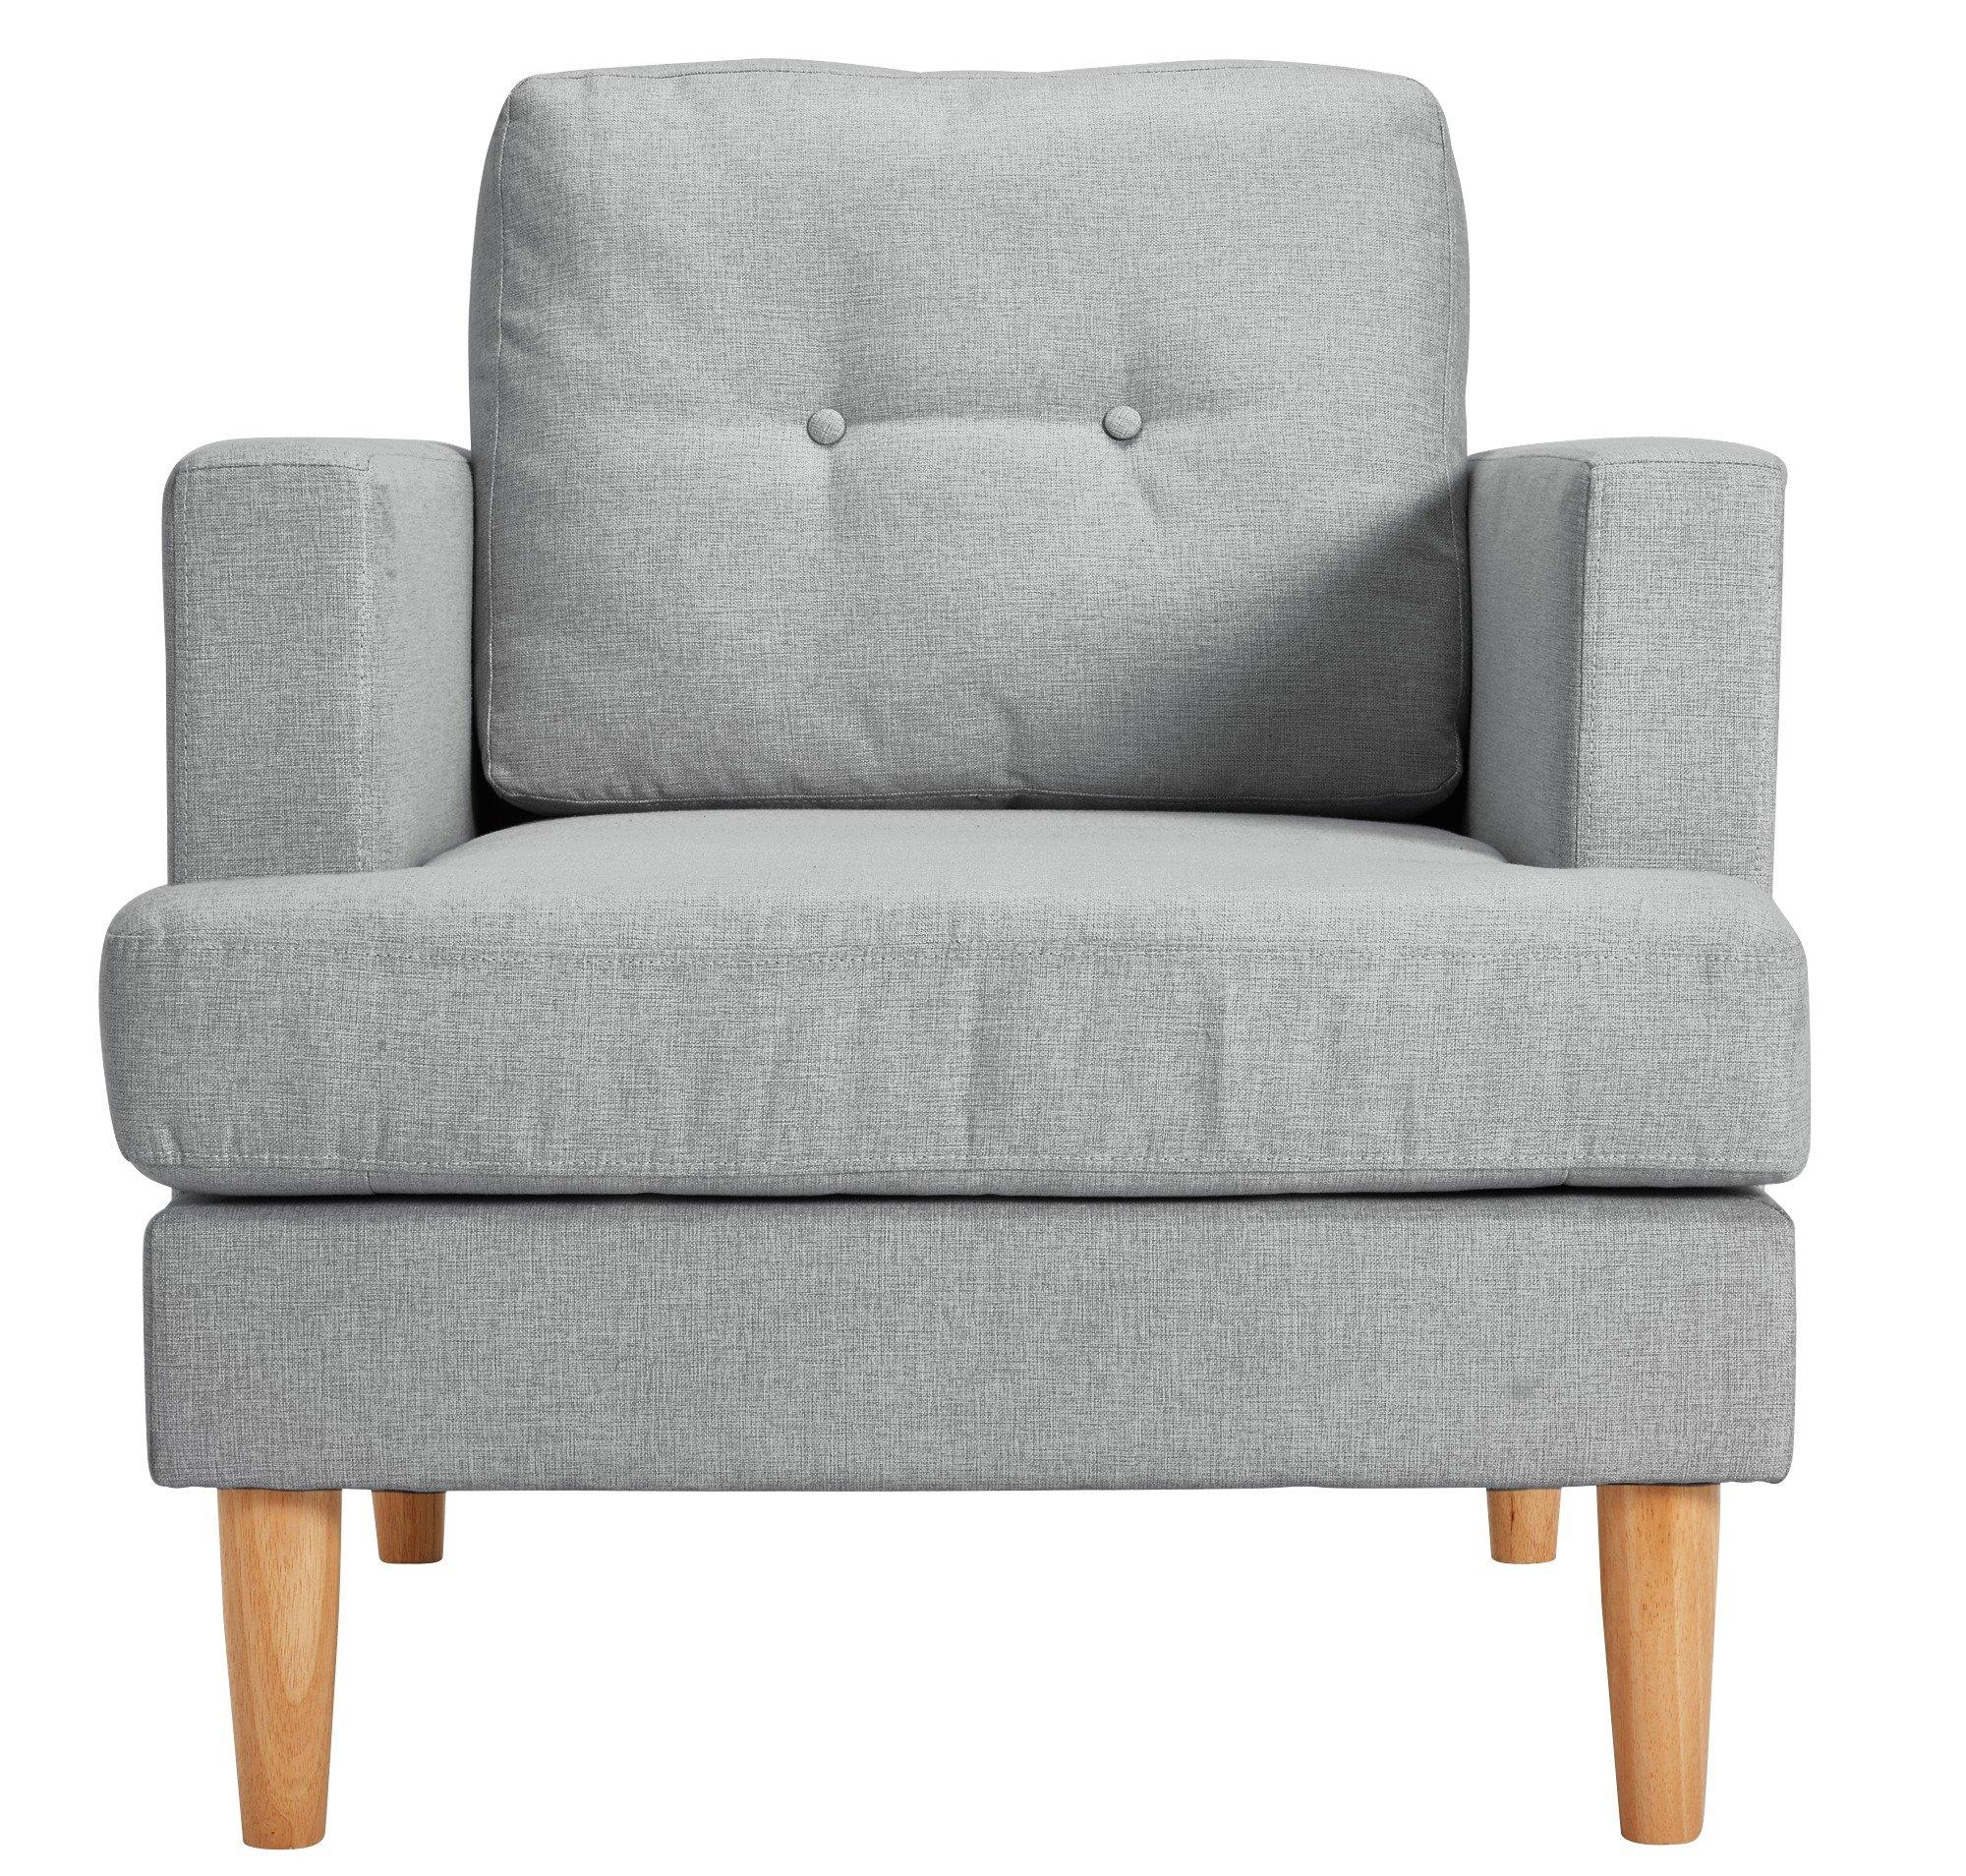 Argos Home Joshua Fabric Armchair - Light Grey